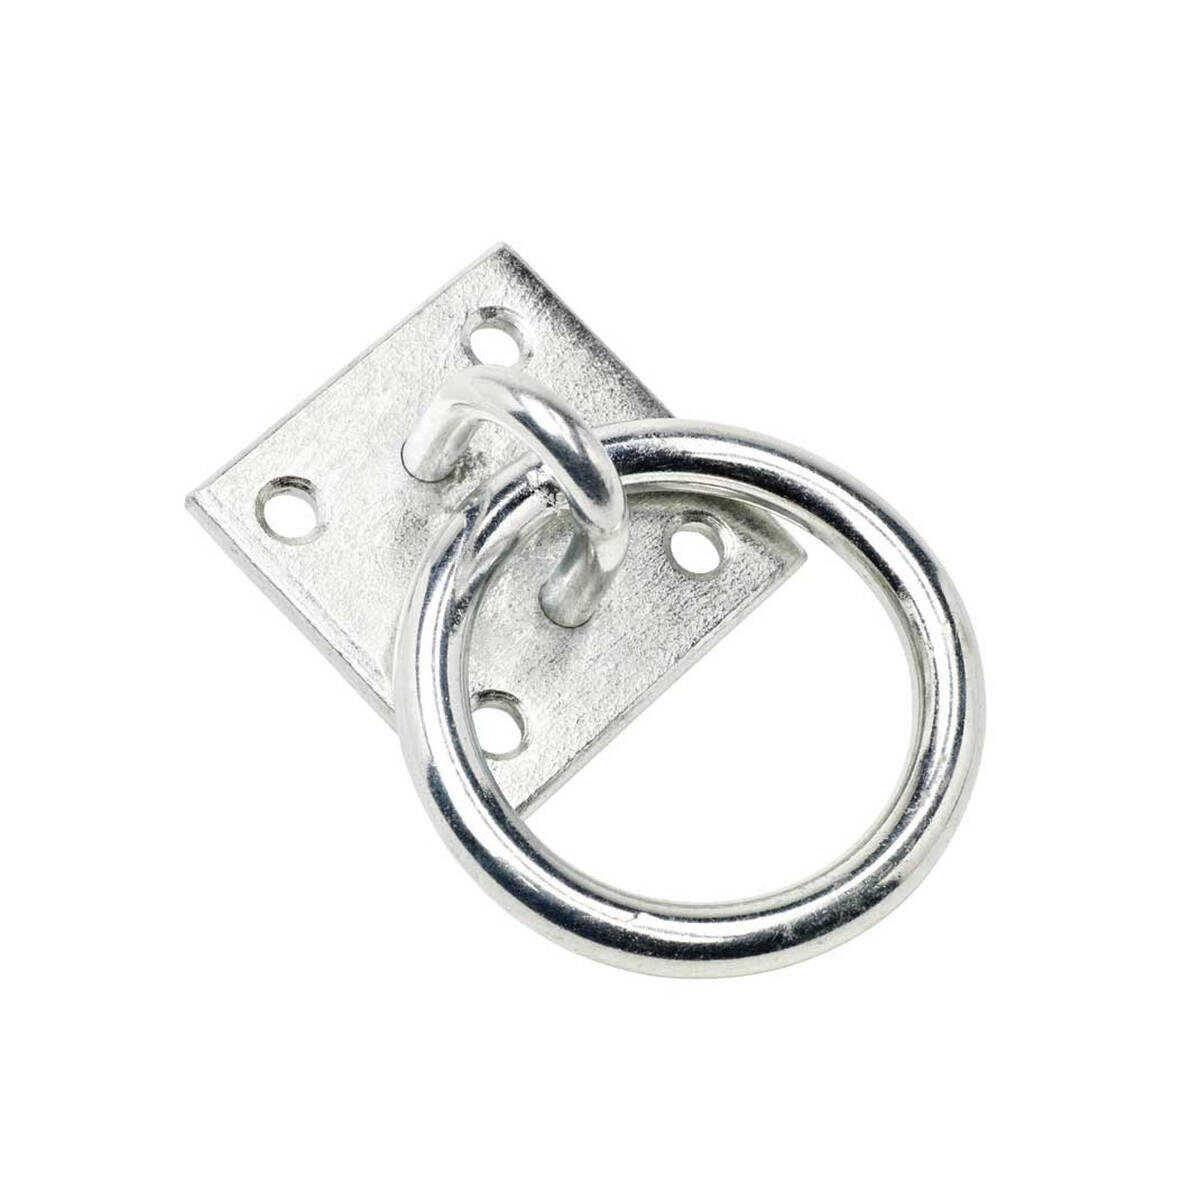 Cottage Craft Galvanised Tie Ring